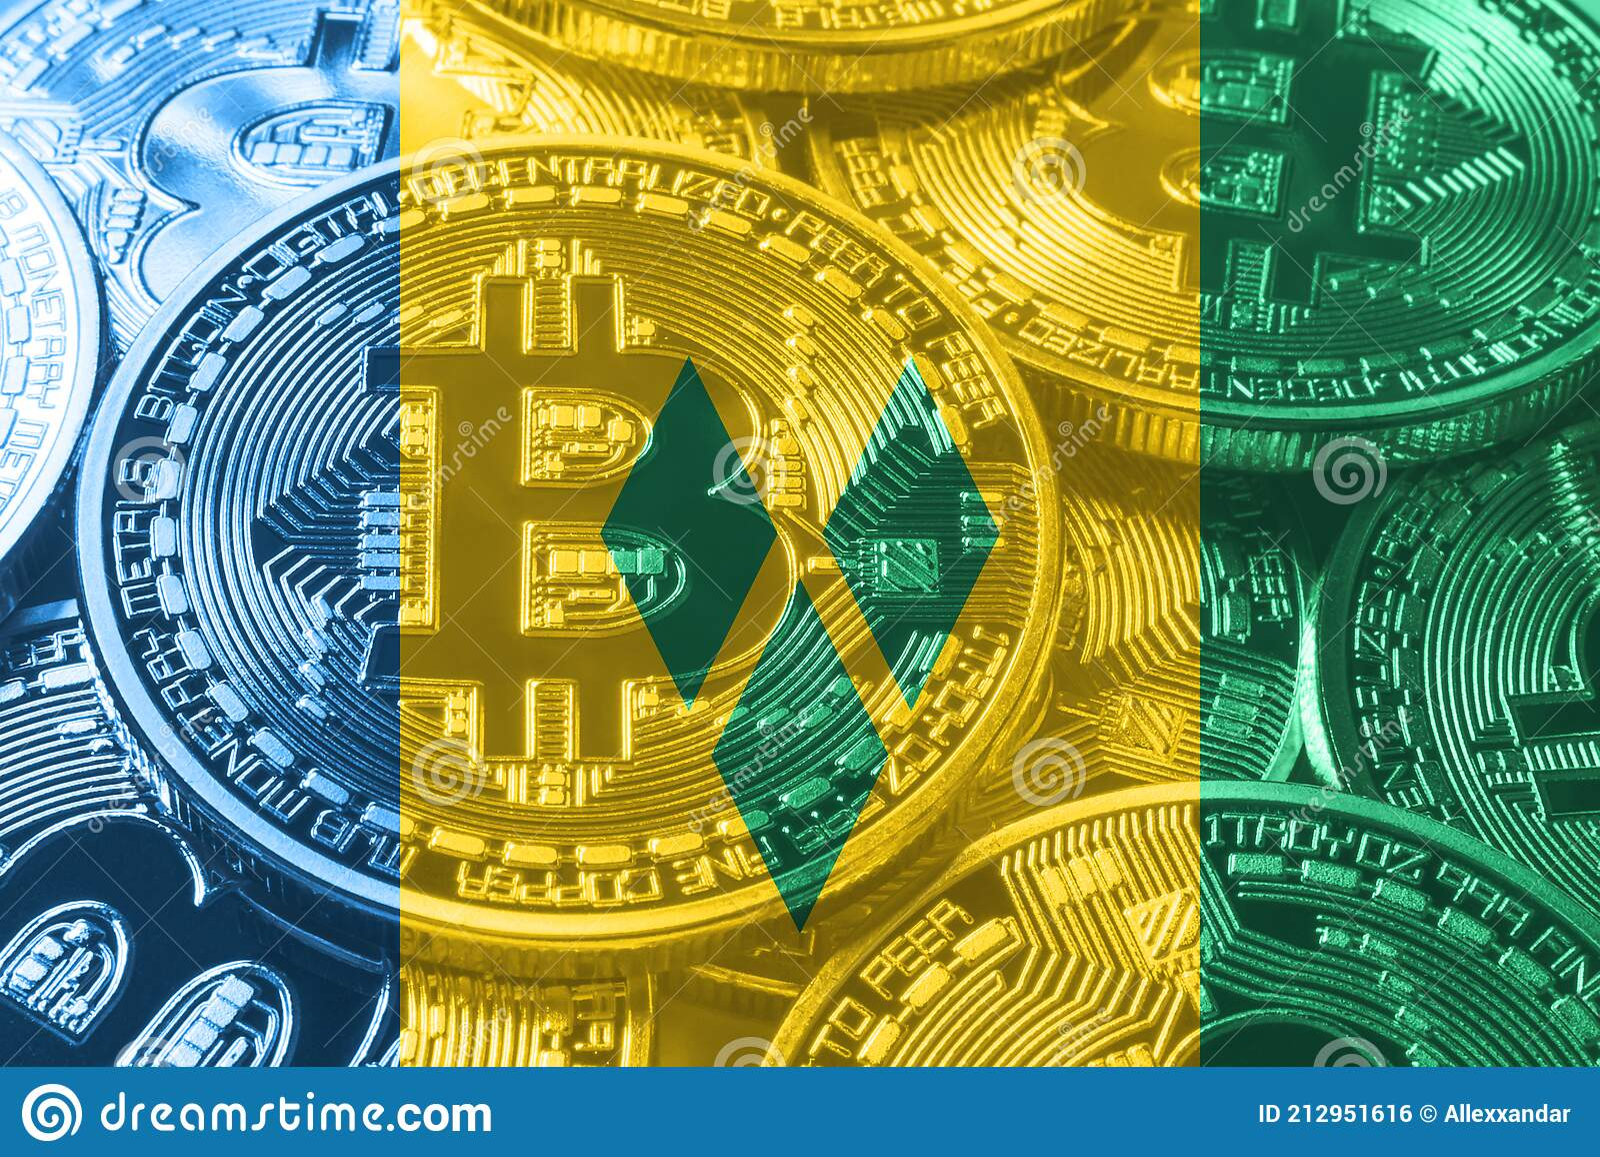 Bitcoin ATM cerca Saint Paul ~ Se Aceptan Bitcoins Saint Paul   liceo-orazio.it